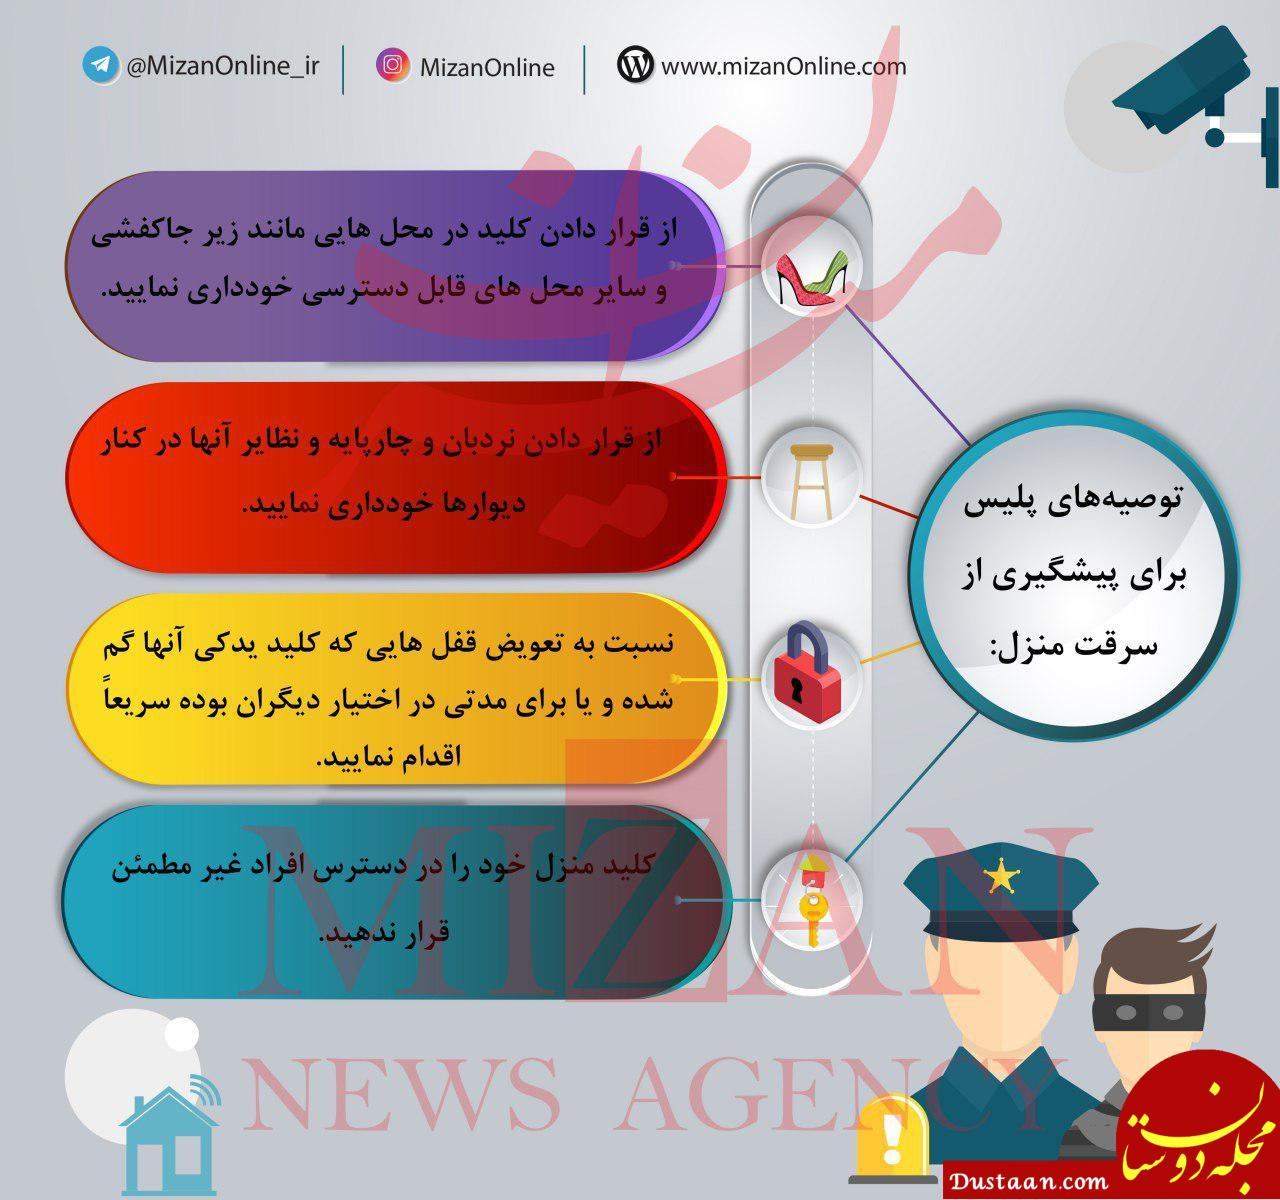 www.dustaan.com توصیه های پلیس برای پیشگیری از سرقت خانه ها در نوروز